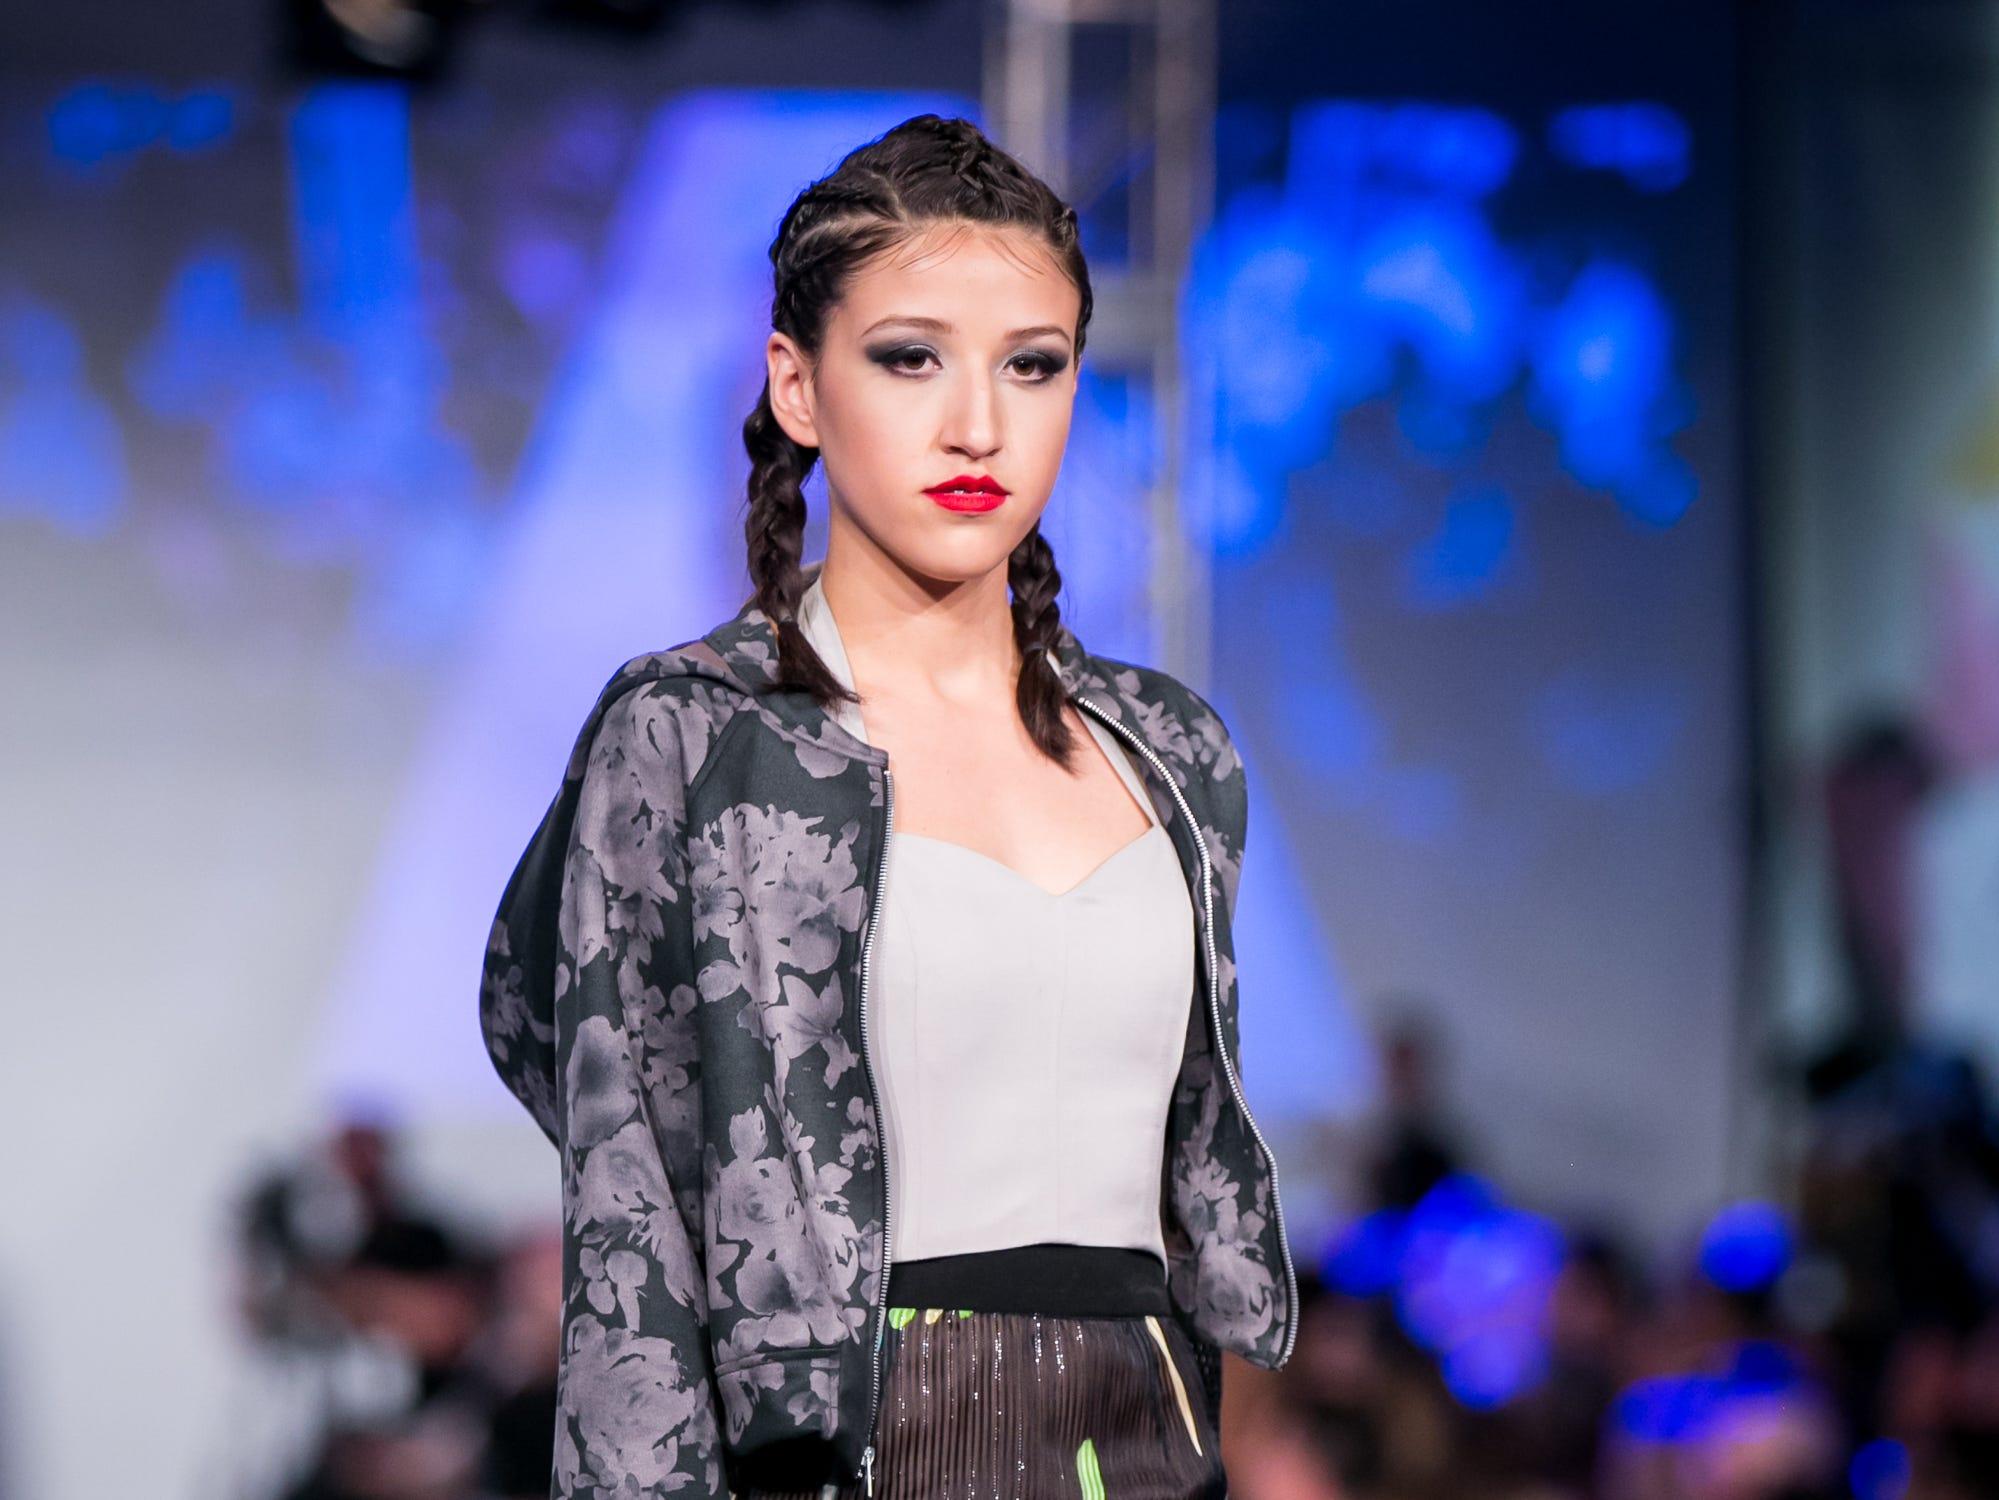 Amanda Casarez's runway during Phoenix Fashion Week at Talking Stick Resort in Scottsdale on Saturday, October 20, 2018.